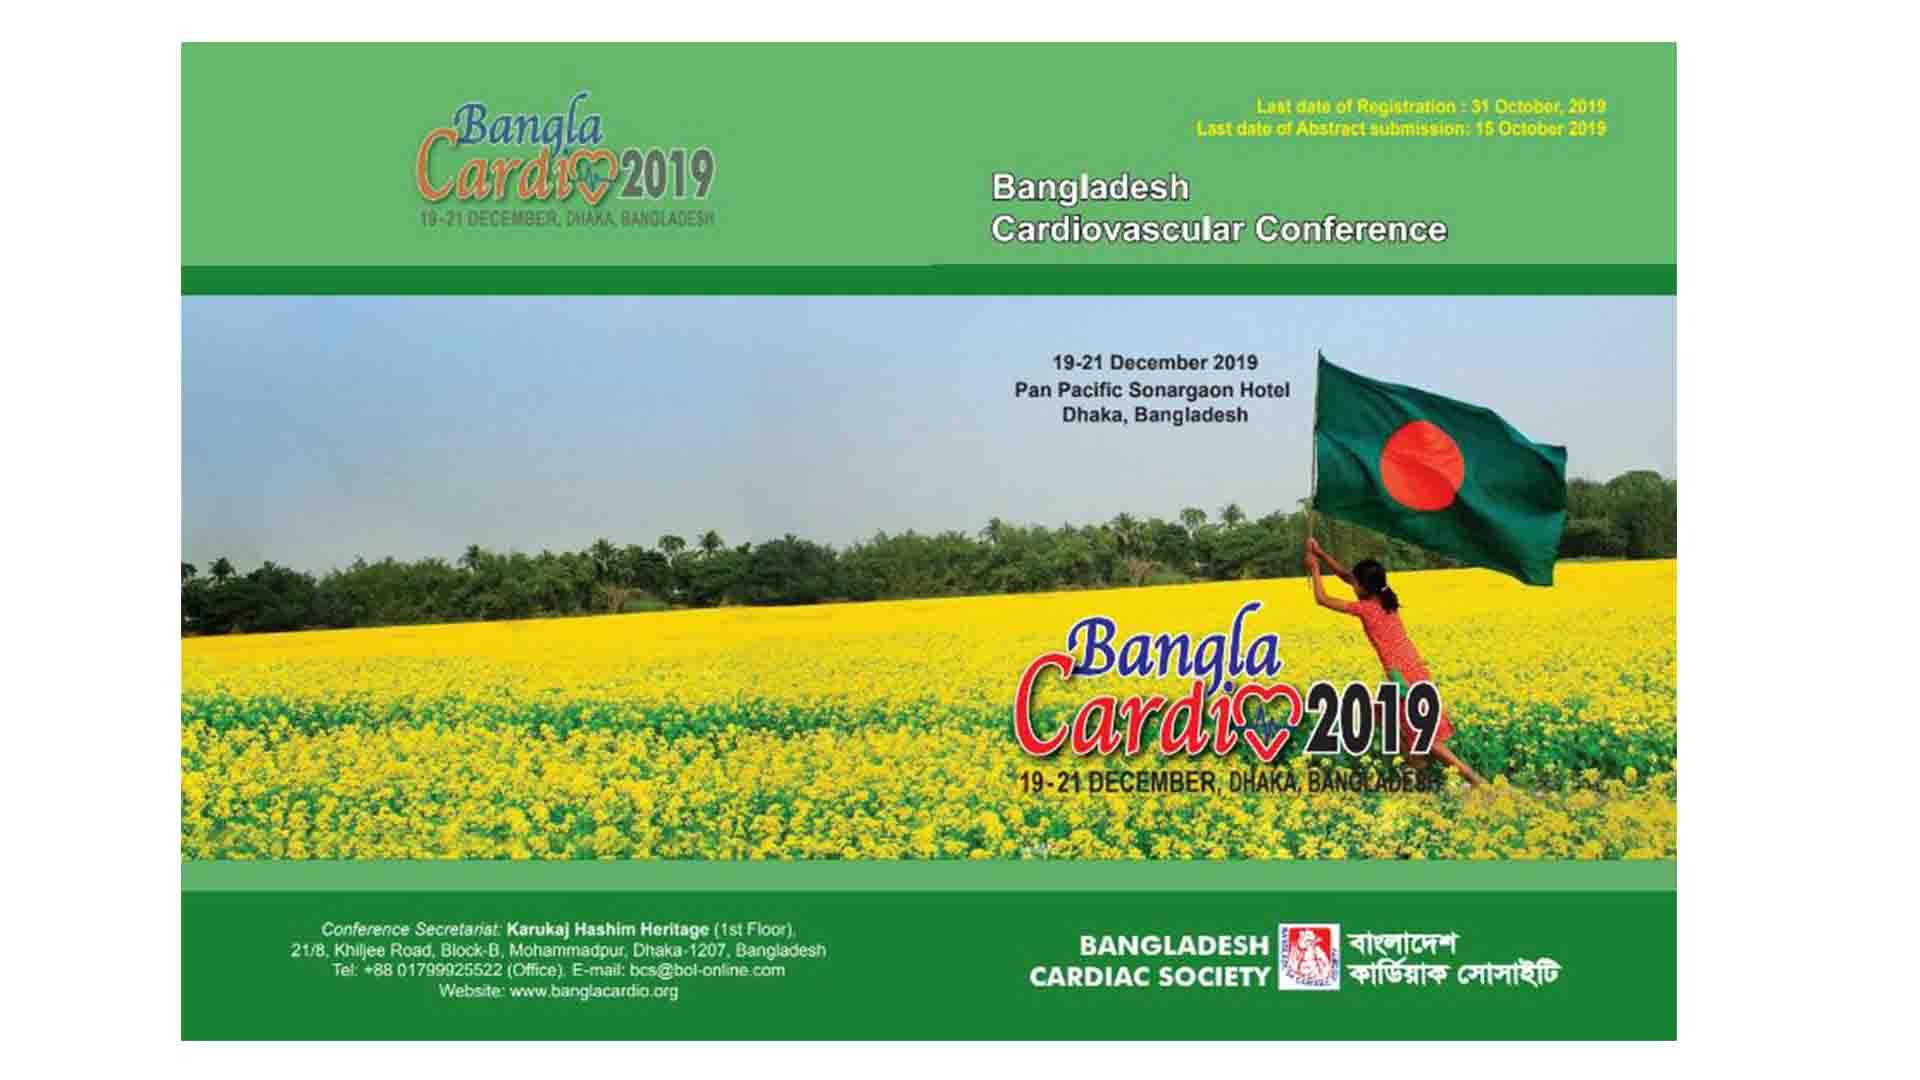 Banglacardio :: Bangladesh Cardiac Society